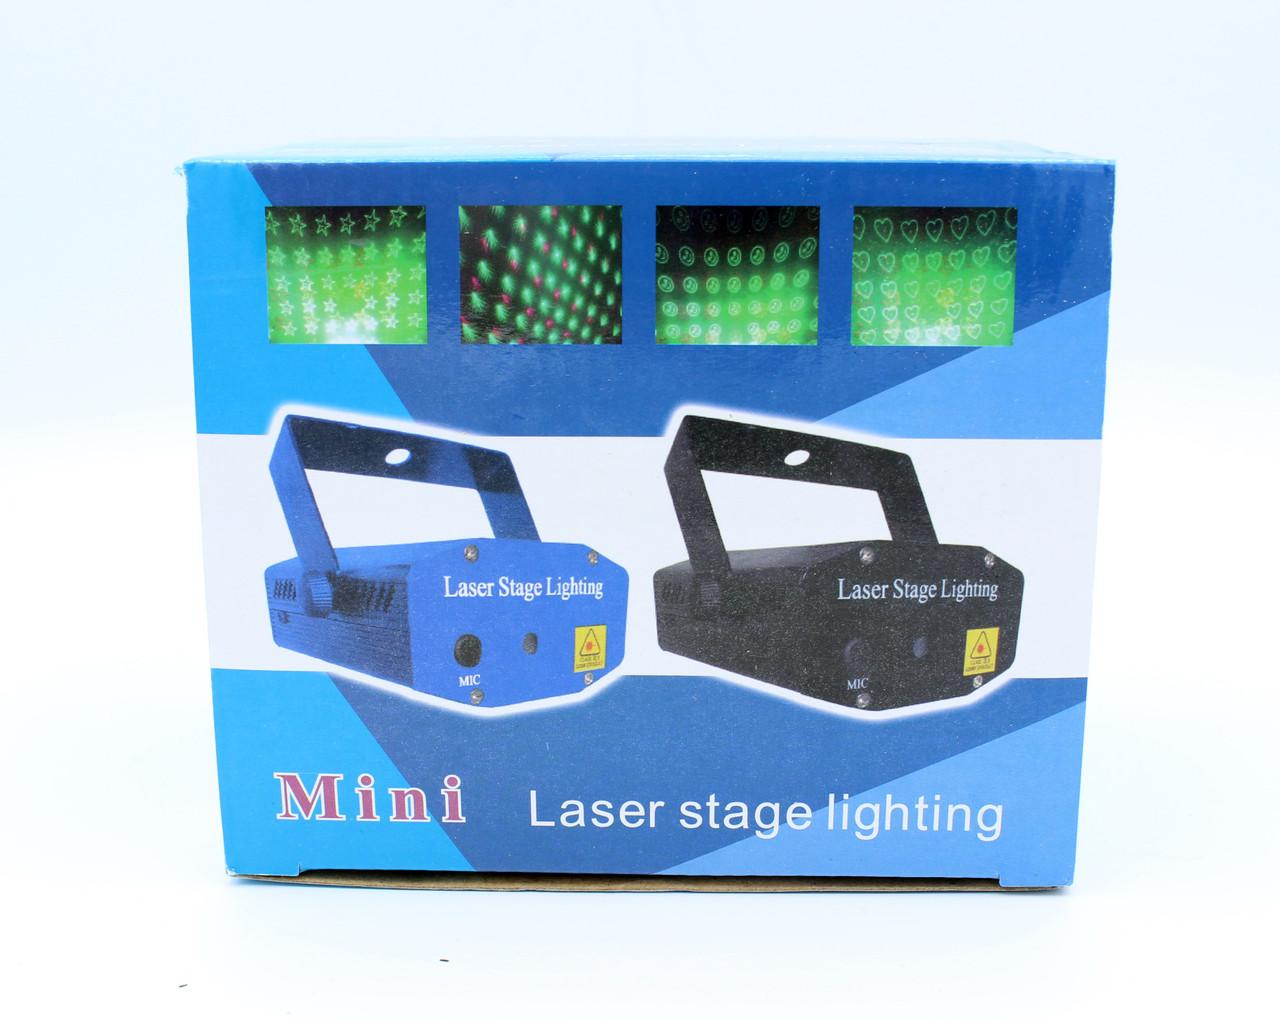 Мини лазер STLS Laser Mini 12 светит Цветочками